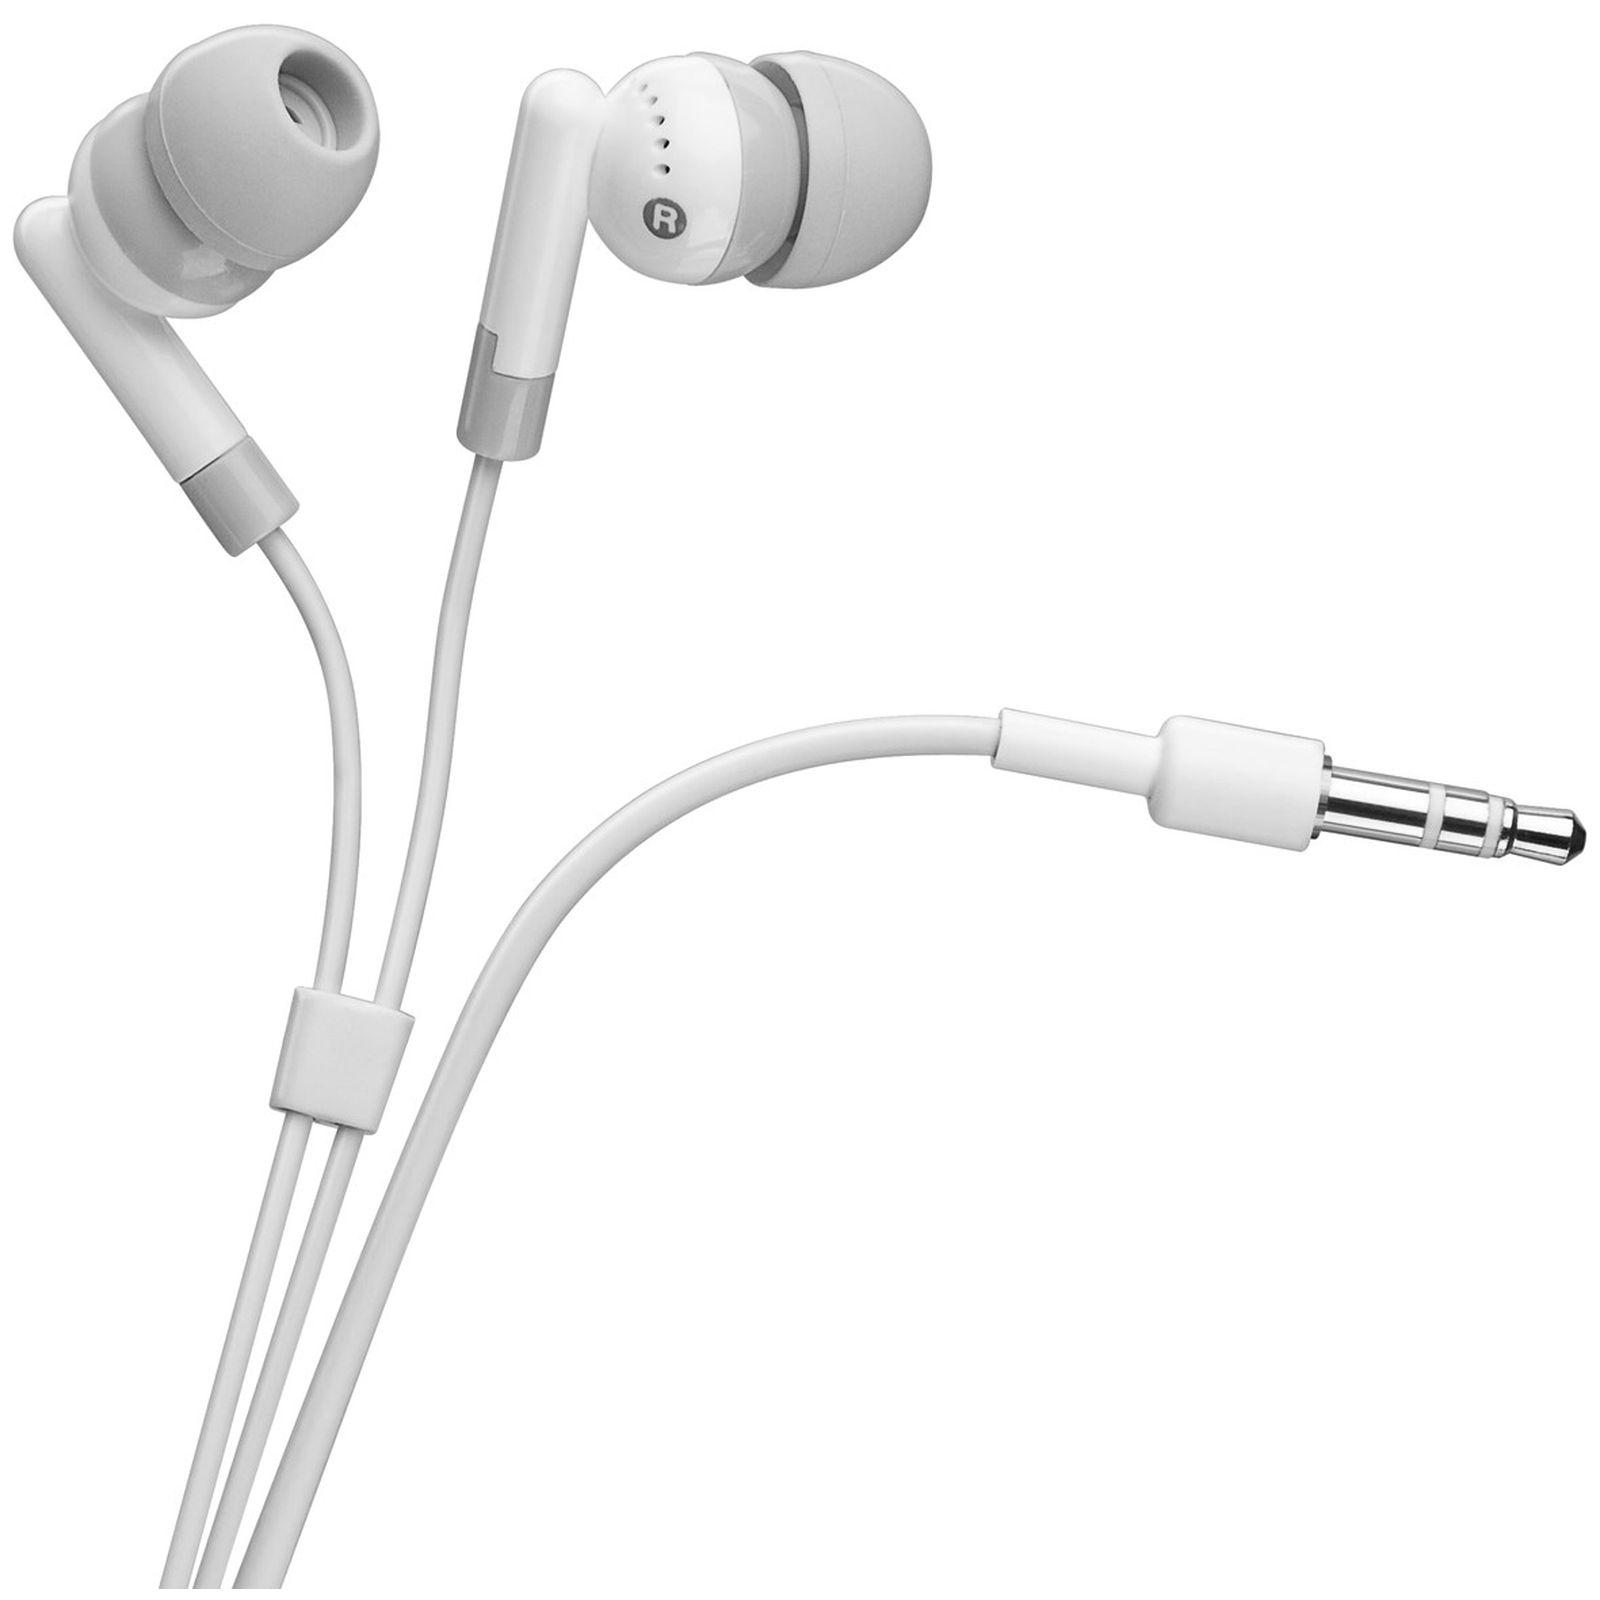 Metall InEar Headset  Kopfhörer für Handy Smartphone Rundkabel MP3 MP4 Mikrofon